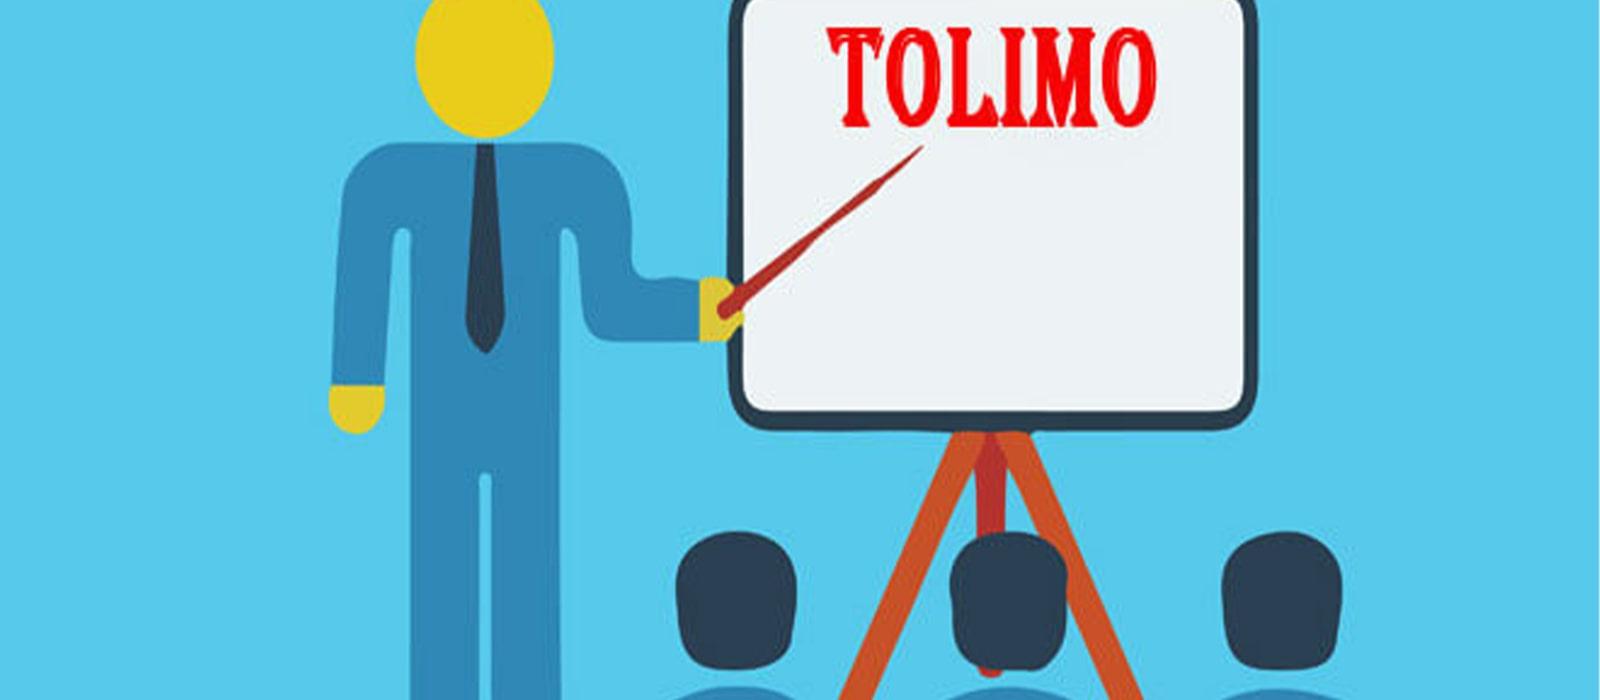 آزمون تولیمو